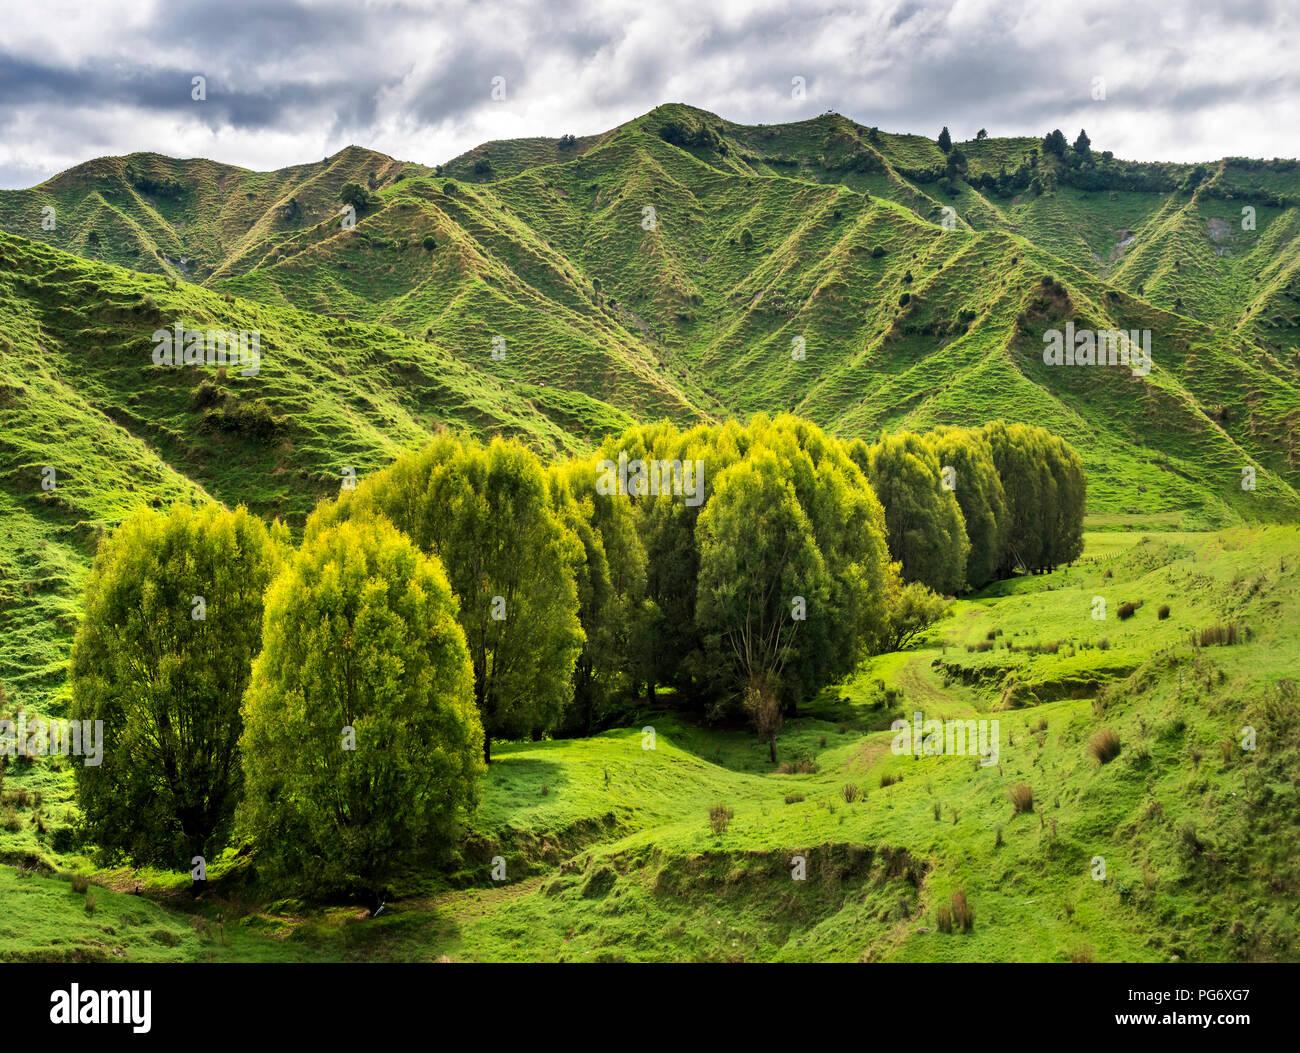 Nueva Zelanda, Isla Norte, región de Manawatu-Wanganui, paisaje Imagen De Stock